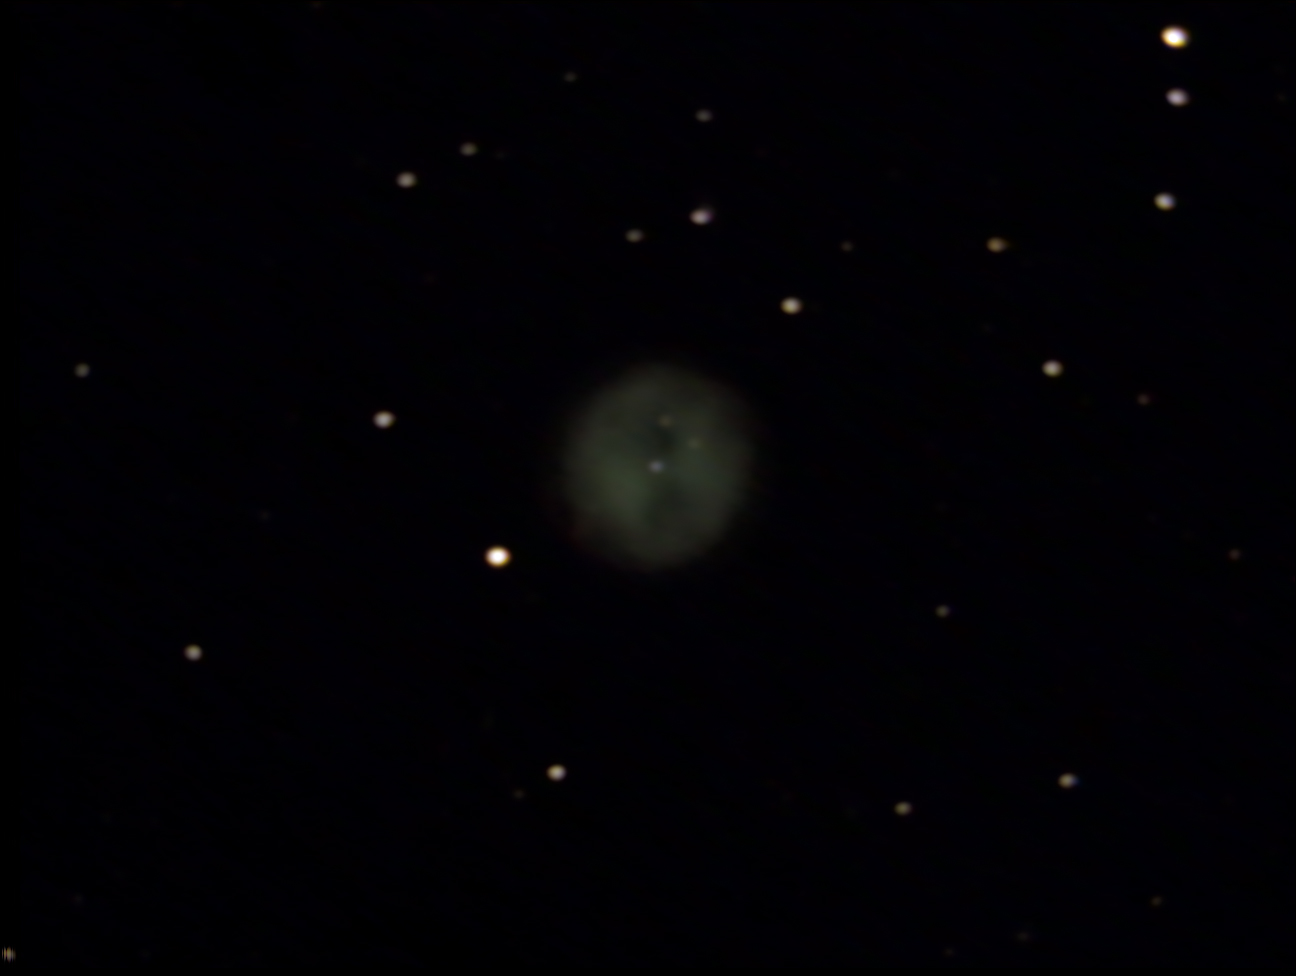 owl nebula ursa major - photo #19